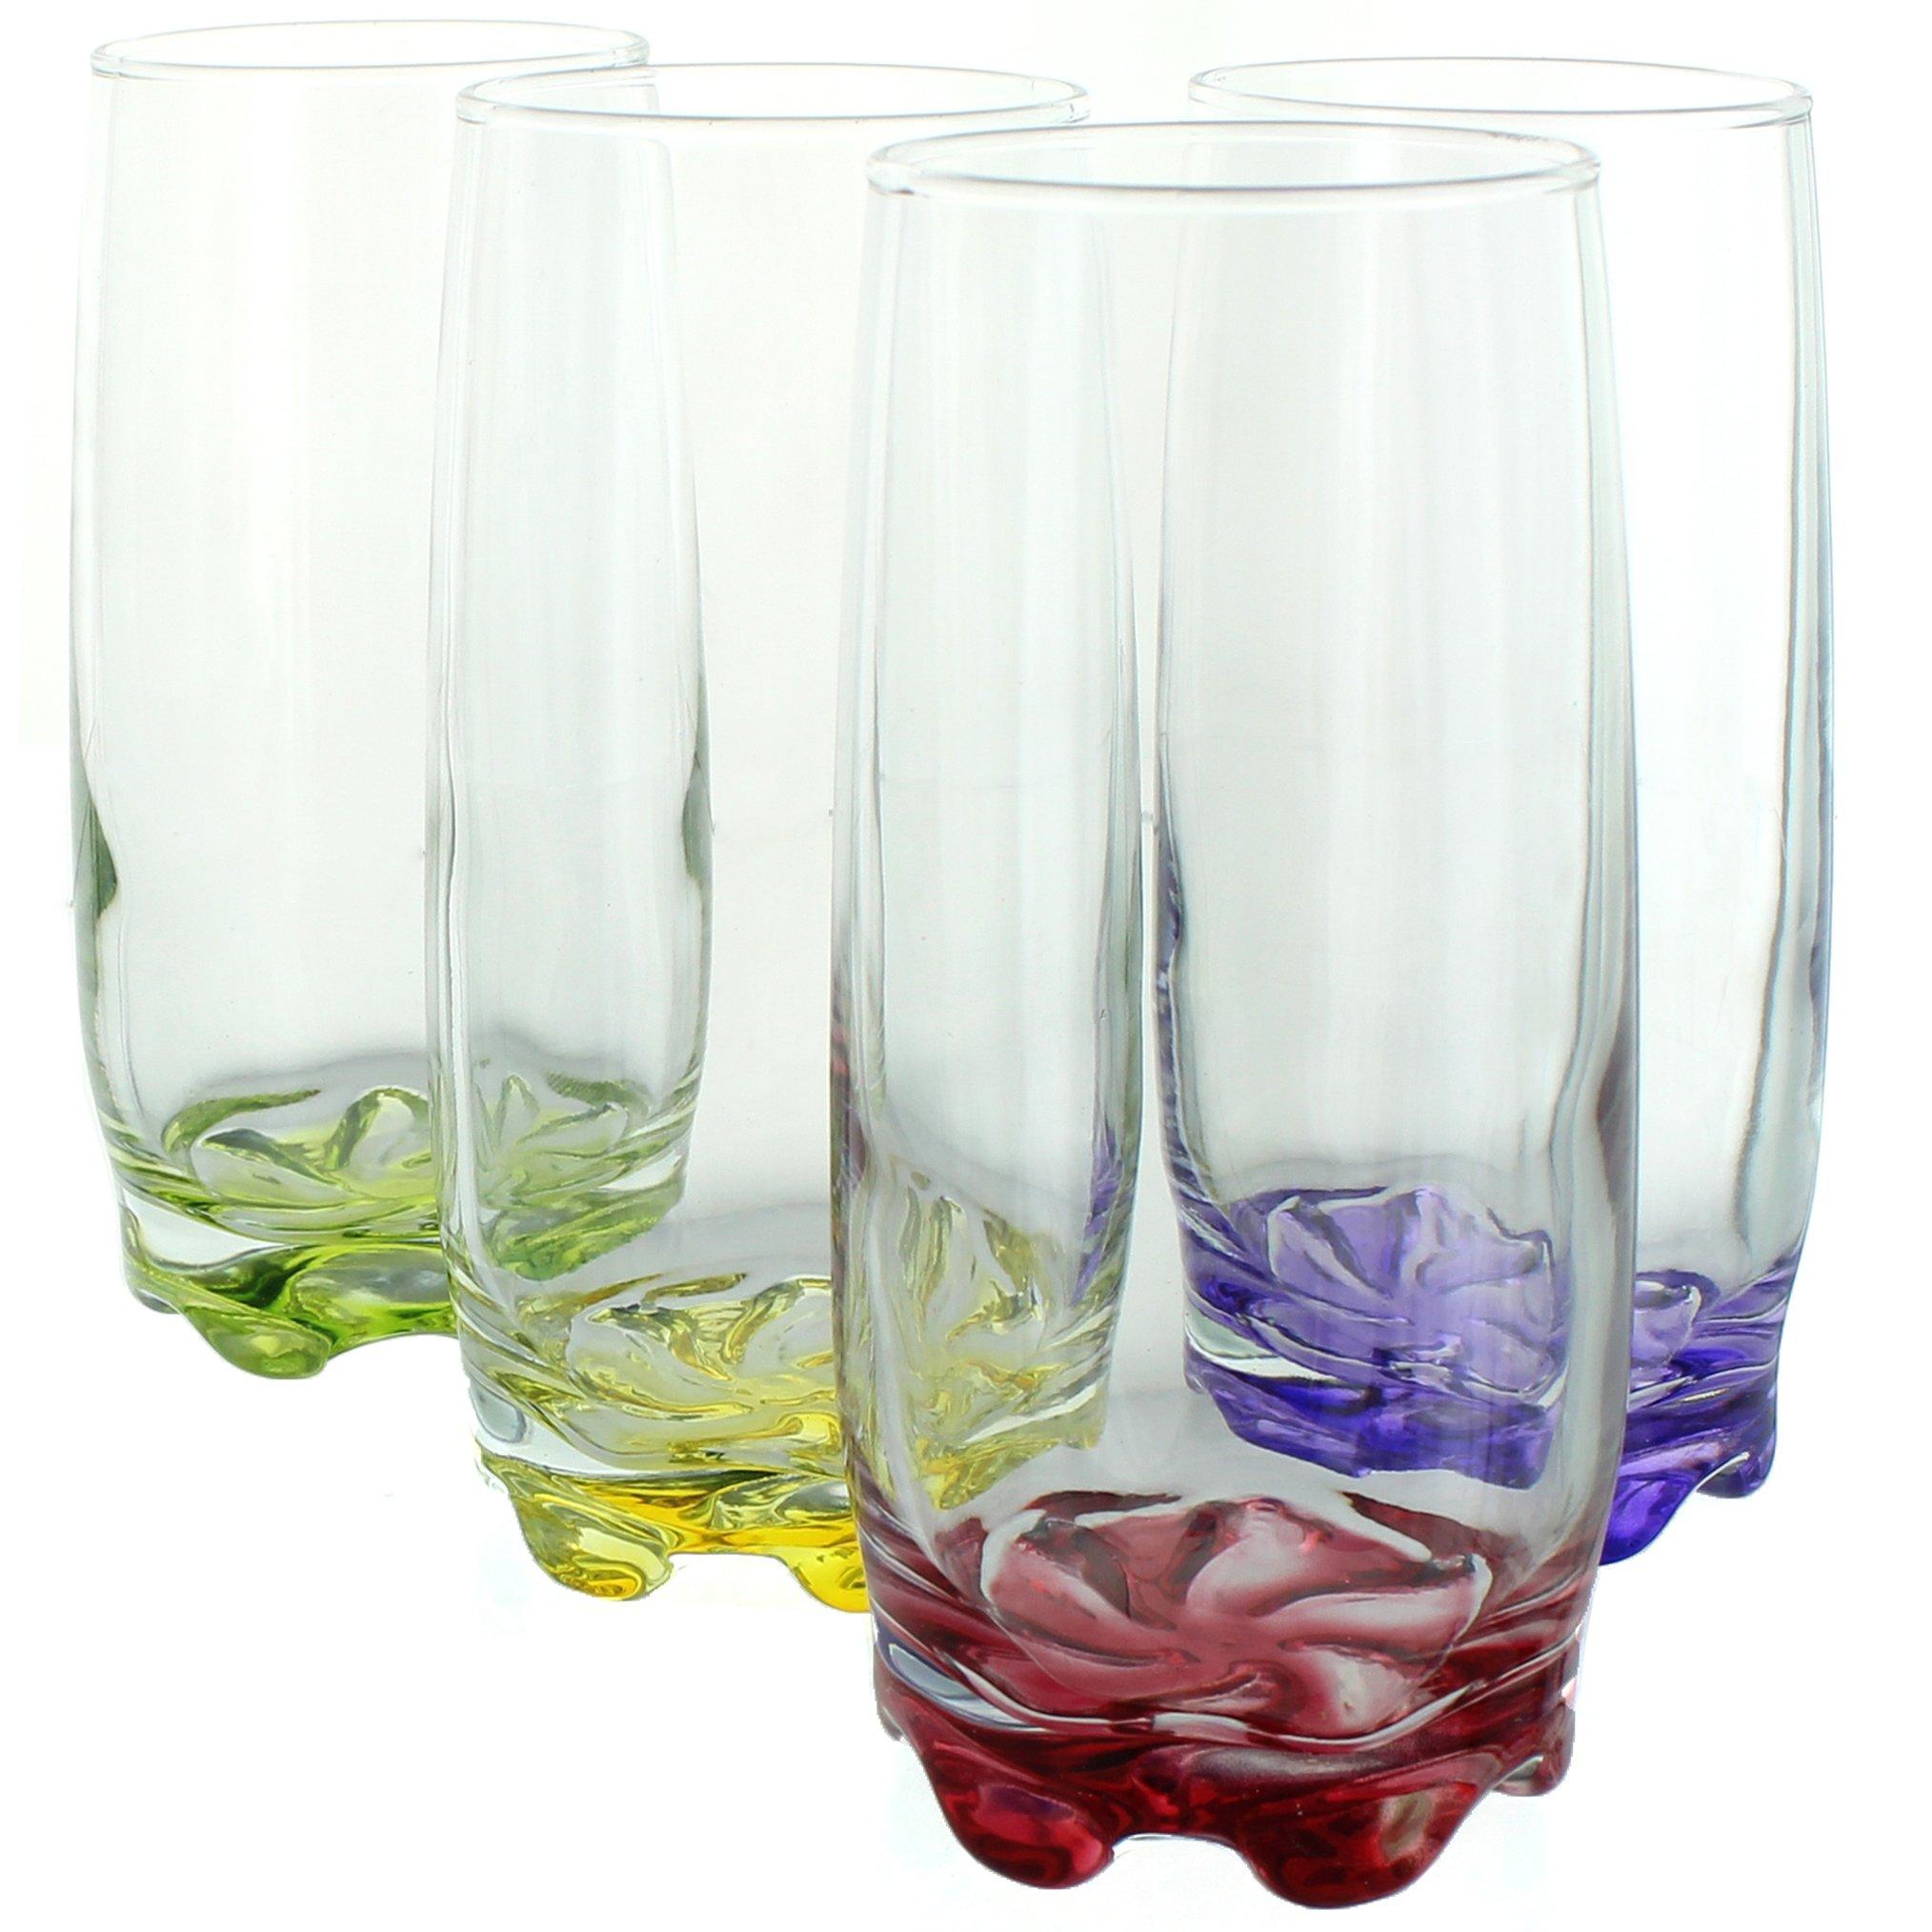 Splash of Color Water & Beverage Highball Glasses, 12.5 Ounce - Set of 4